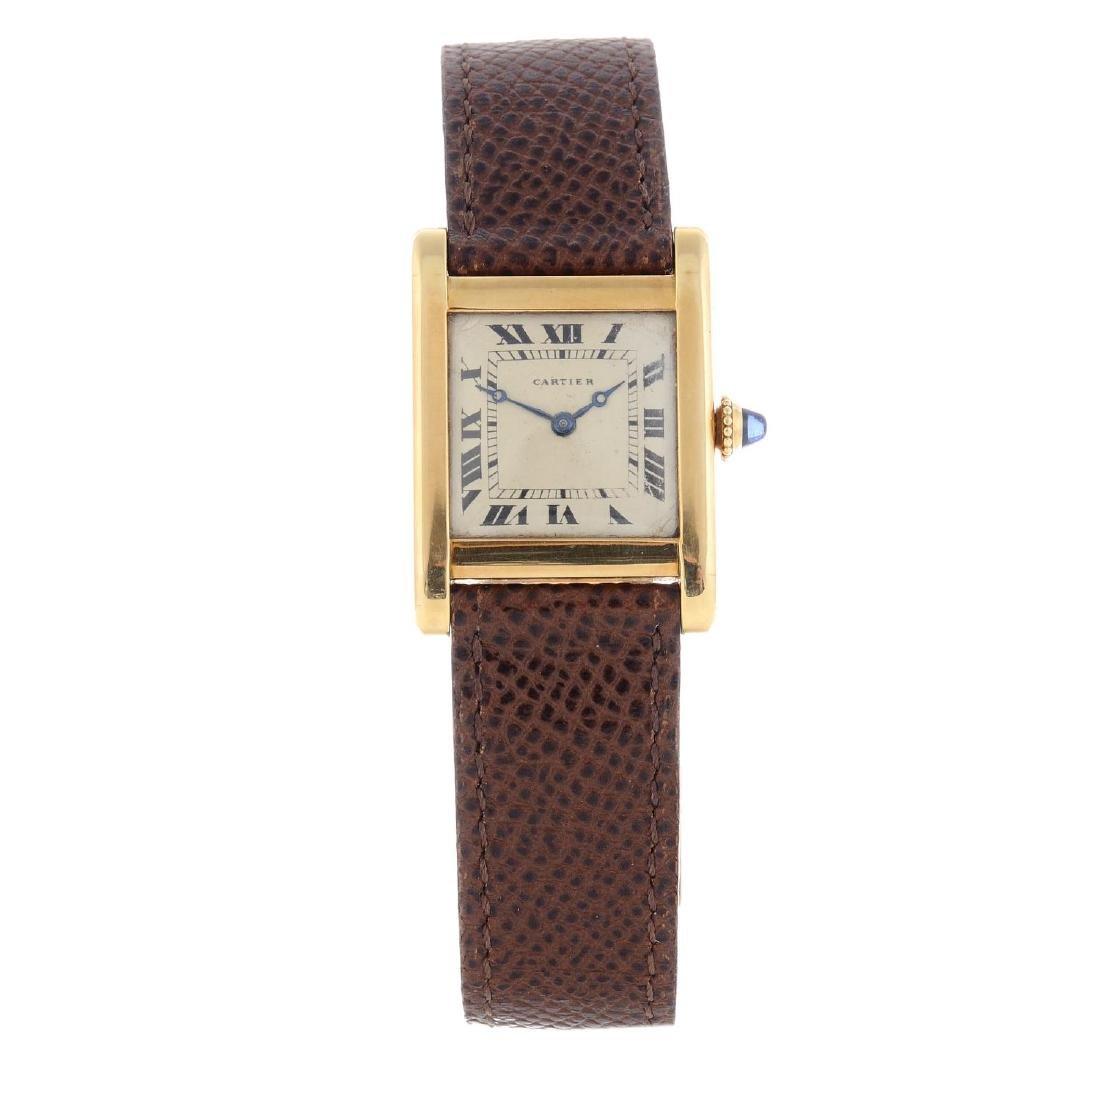 CARTIER - a Tank wrist watch. Yellow metal case stamped